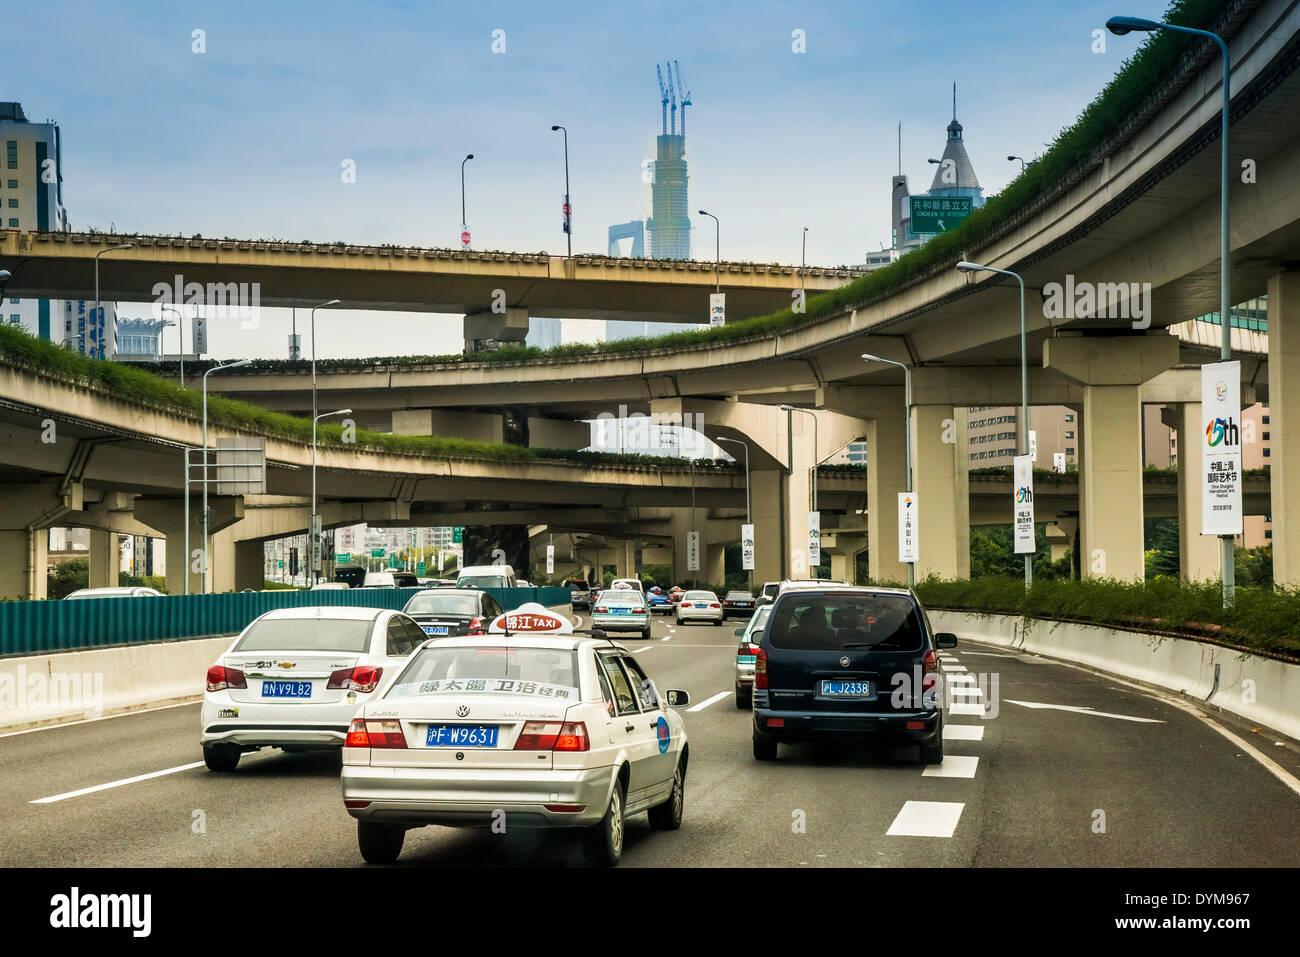 Traffico, Strade elevata, Shanghai, Cina Immagini Stock